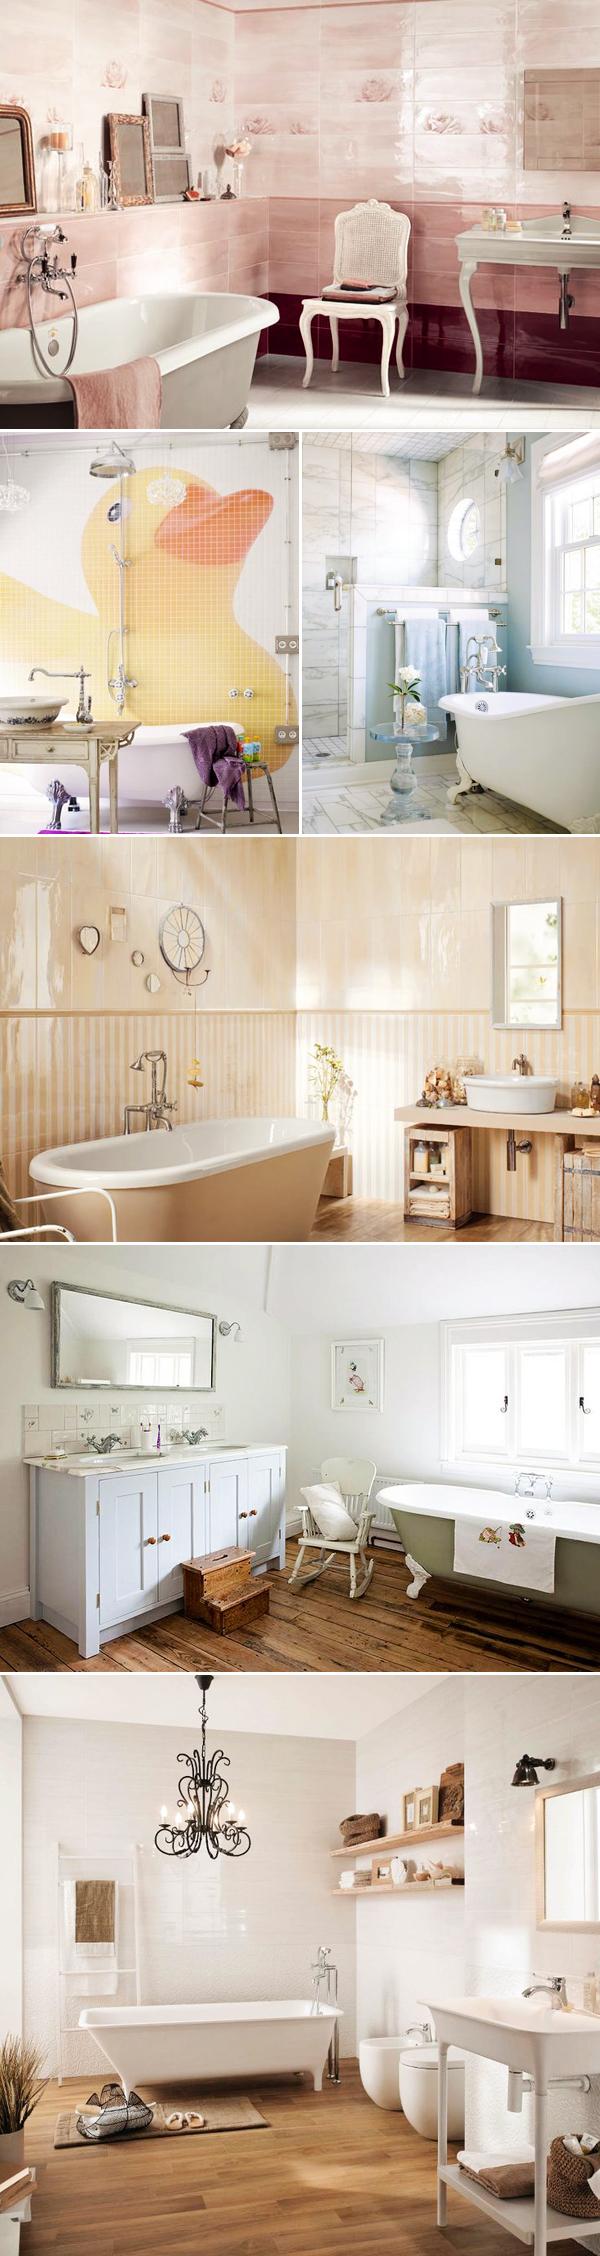 bathroom03-lovely